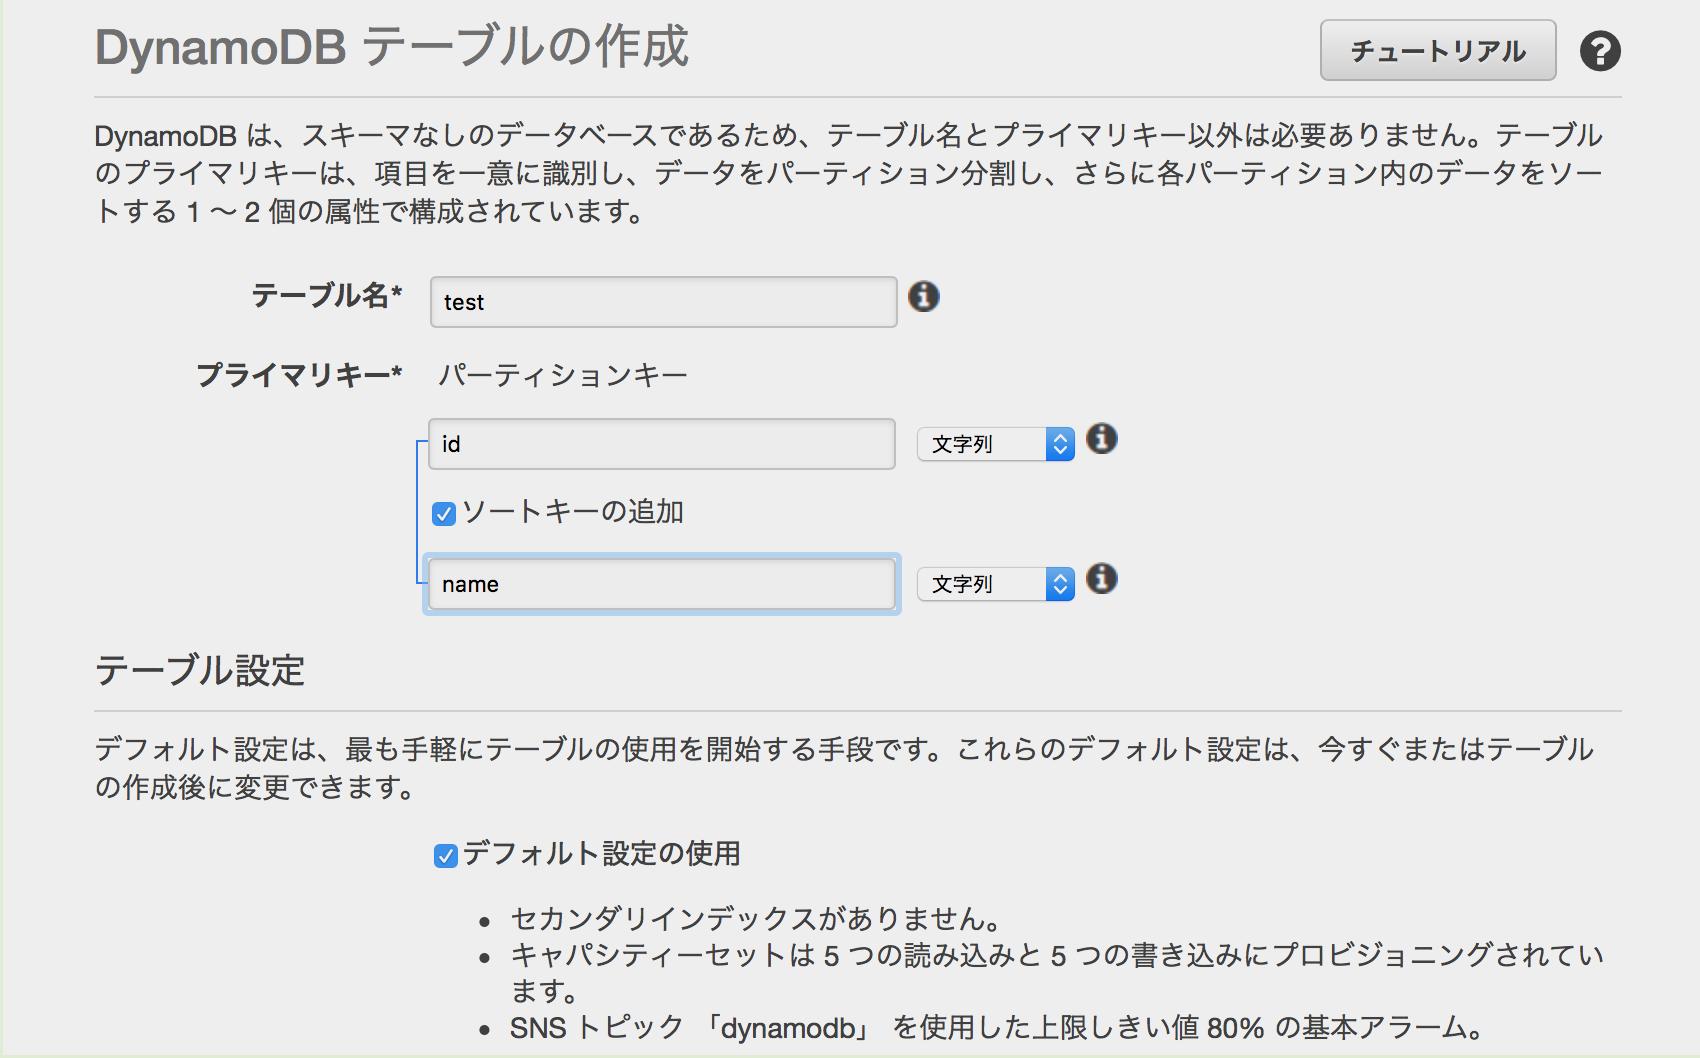 DynamoDBのputItemで追加と更新の実現方法 - Qiita